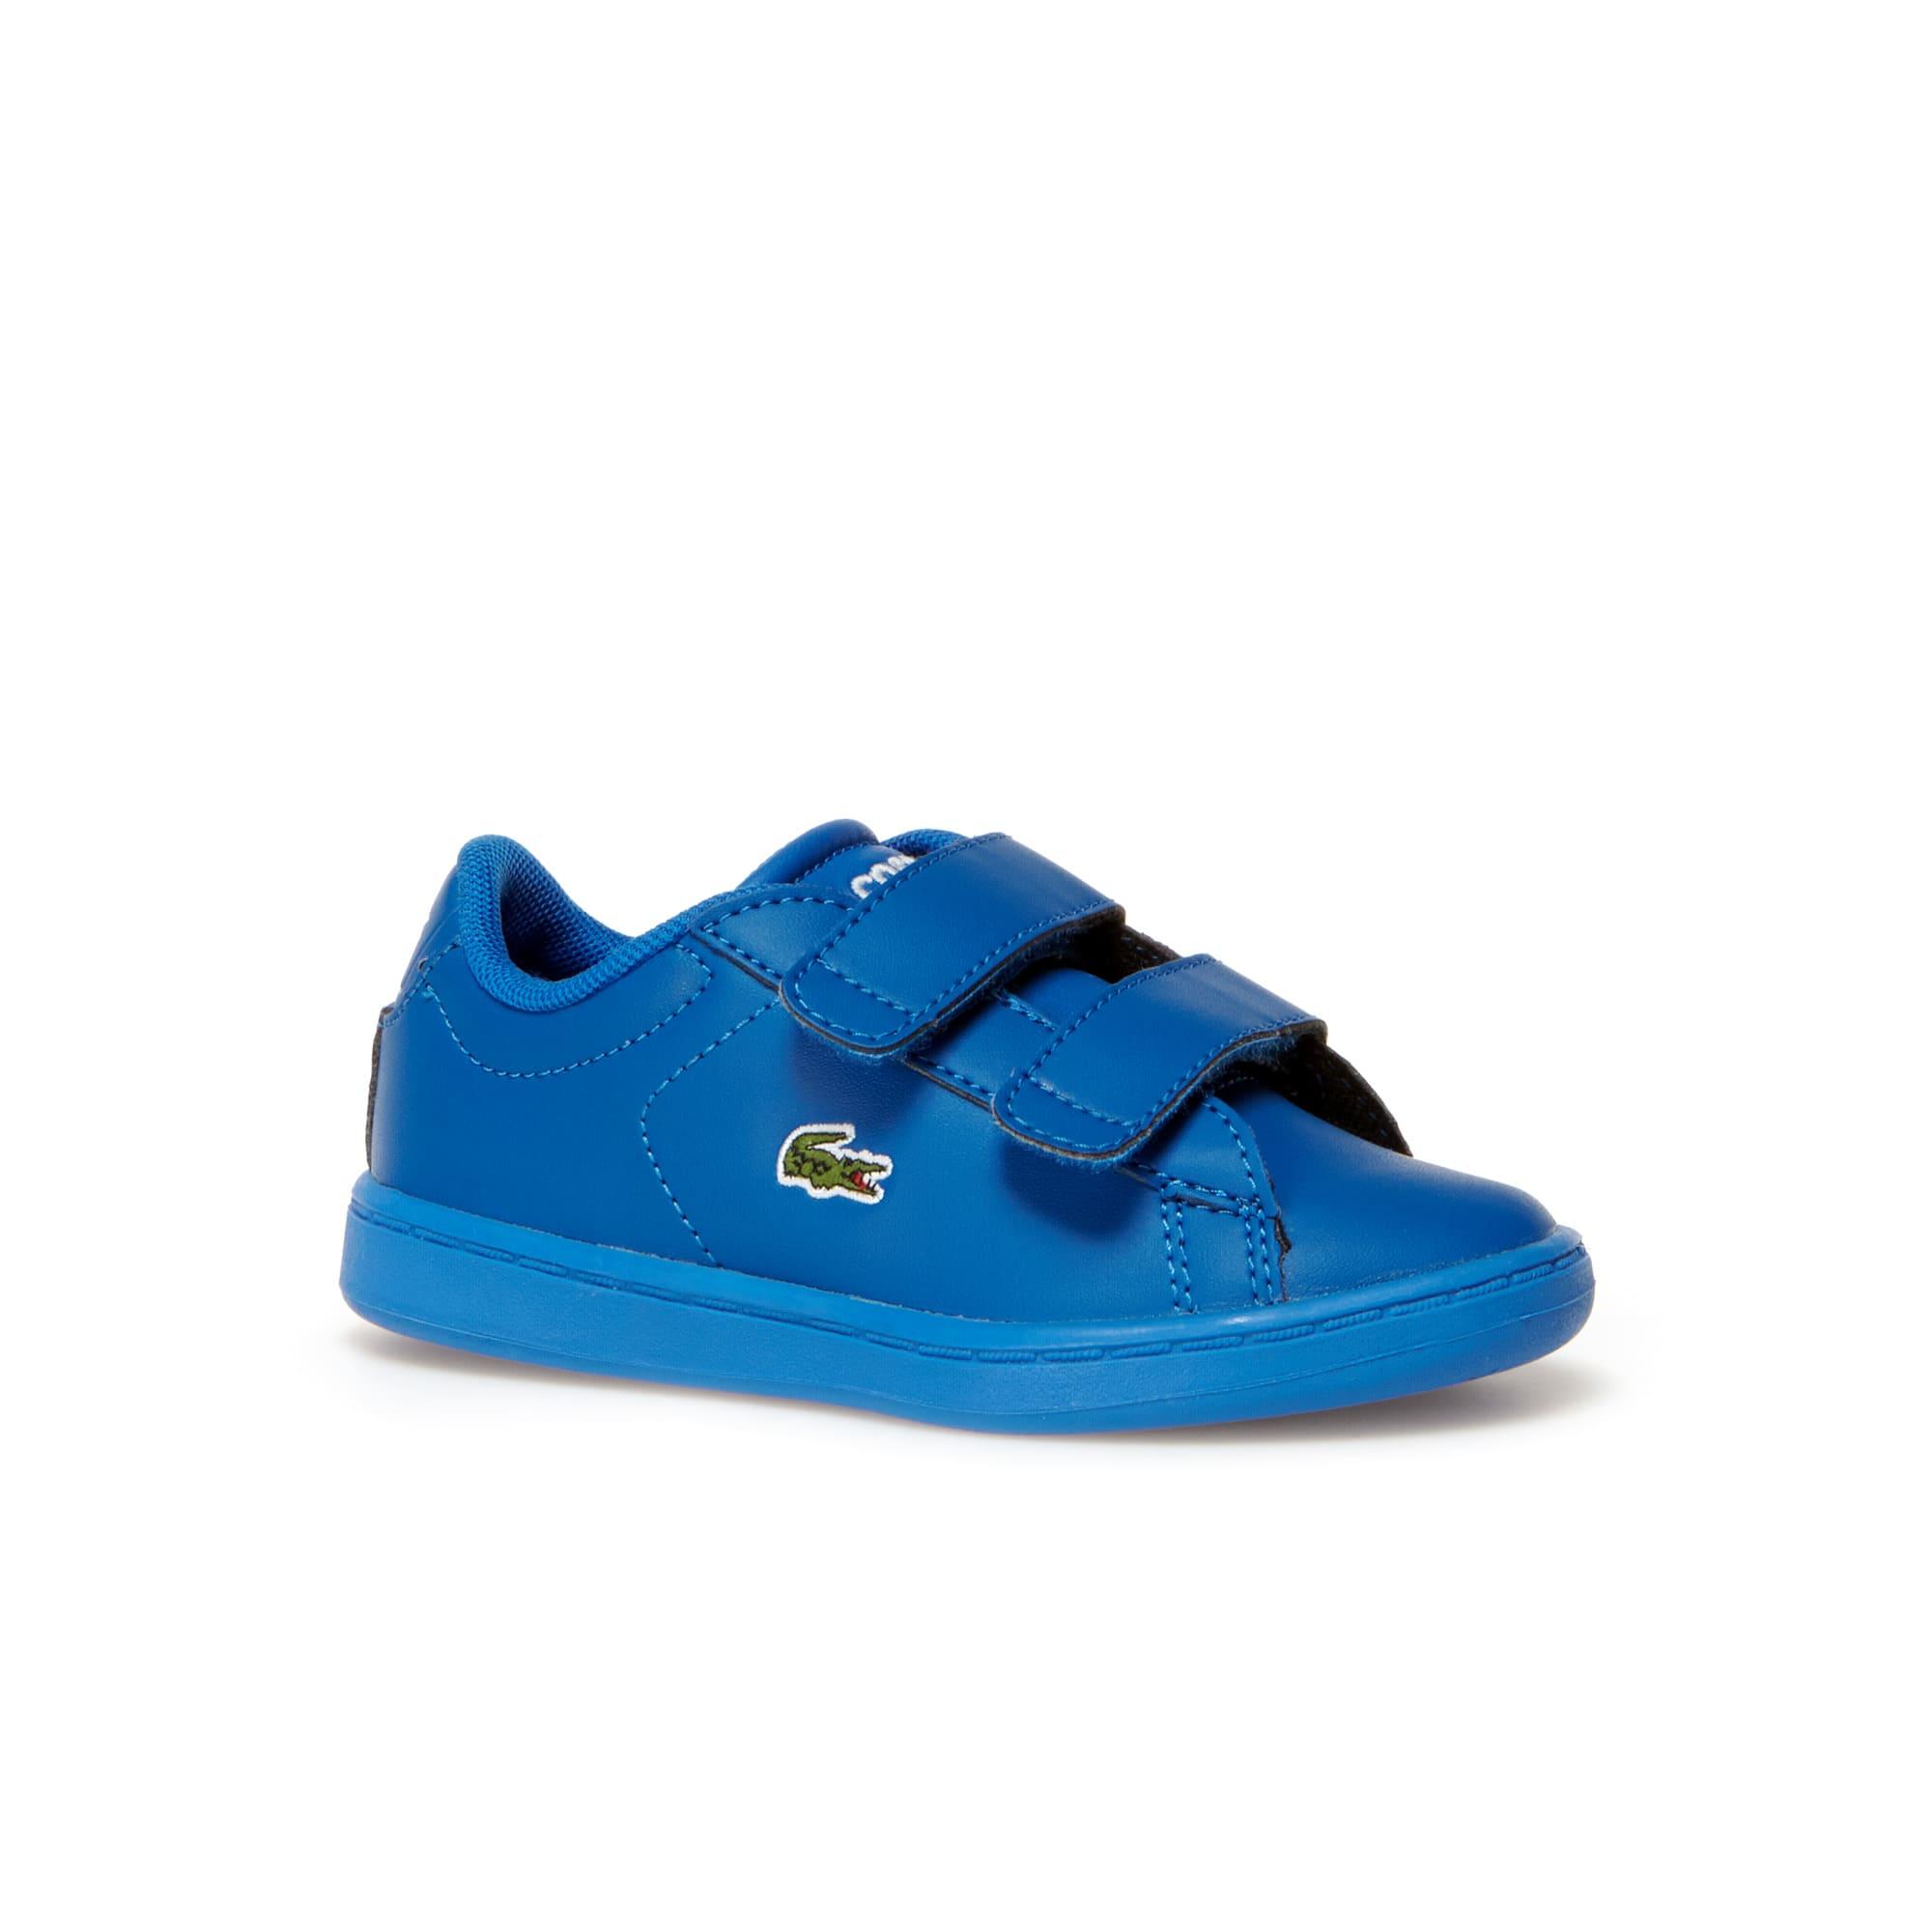 Sneakers Kids Carnaby Evo